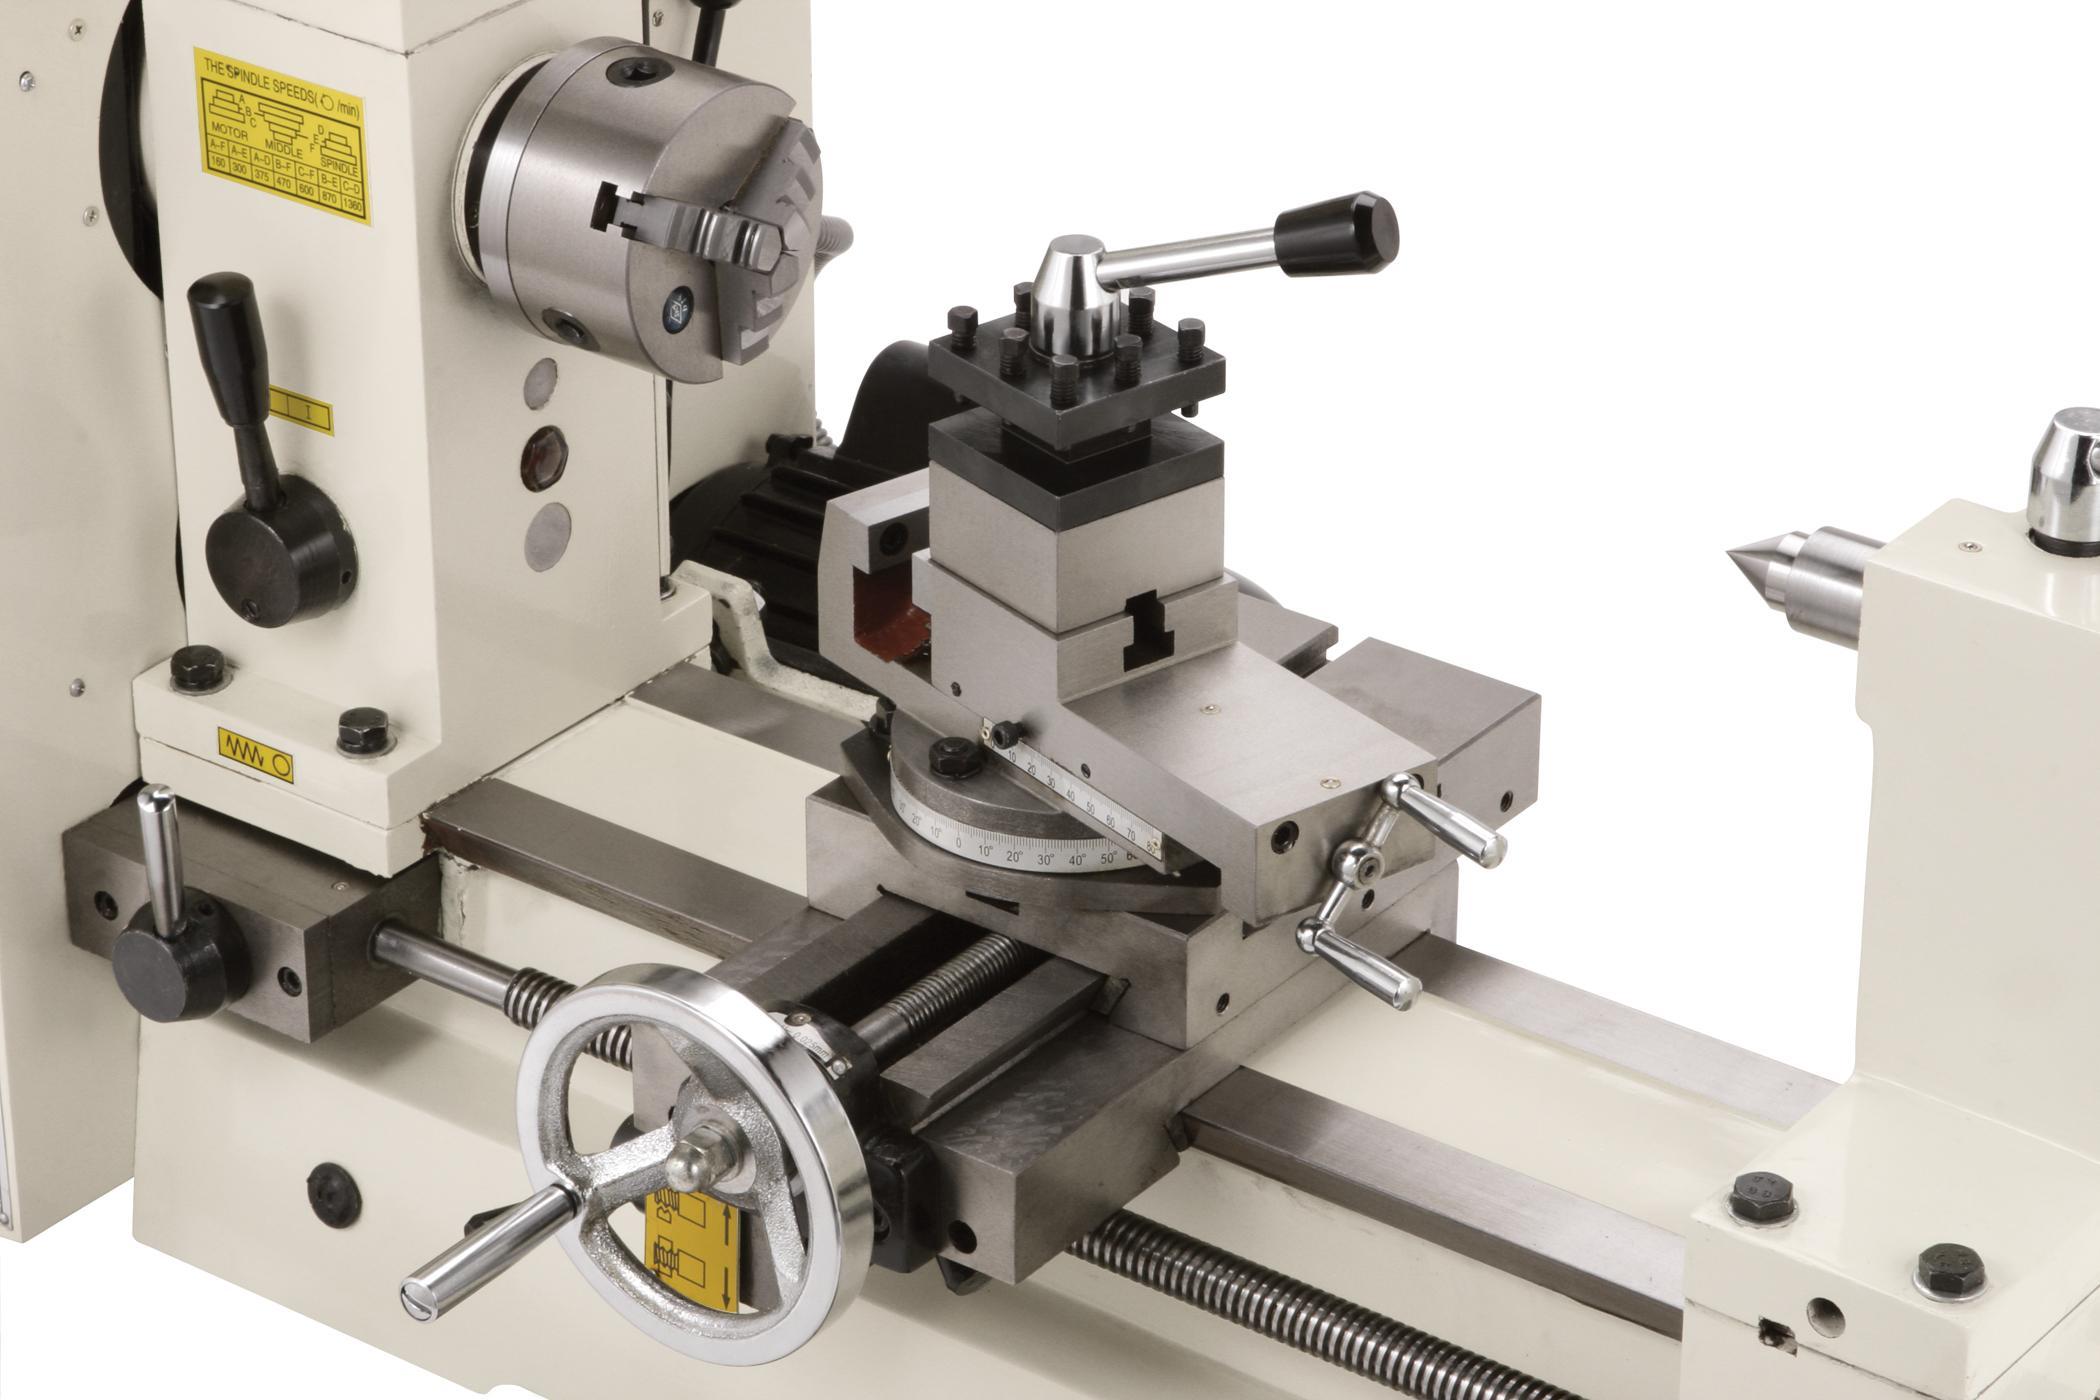 Industrial Metal Lathe Machines Lathe Machines For Sale >> Shop Fox M1018 Combo Lathe Mill